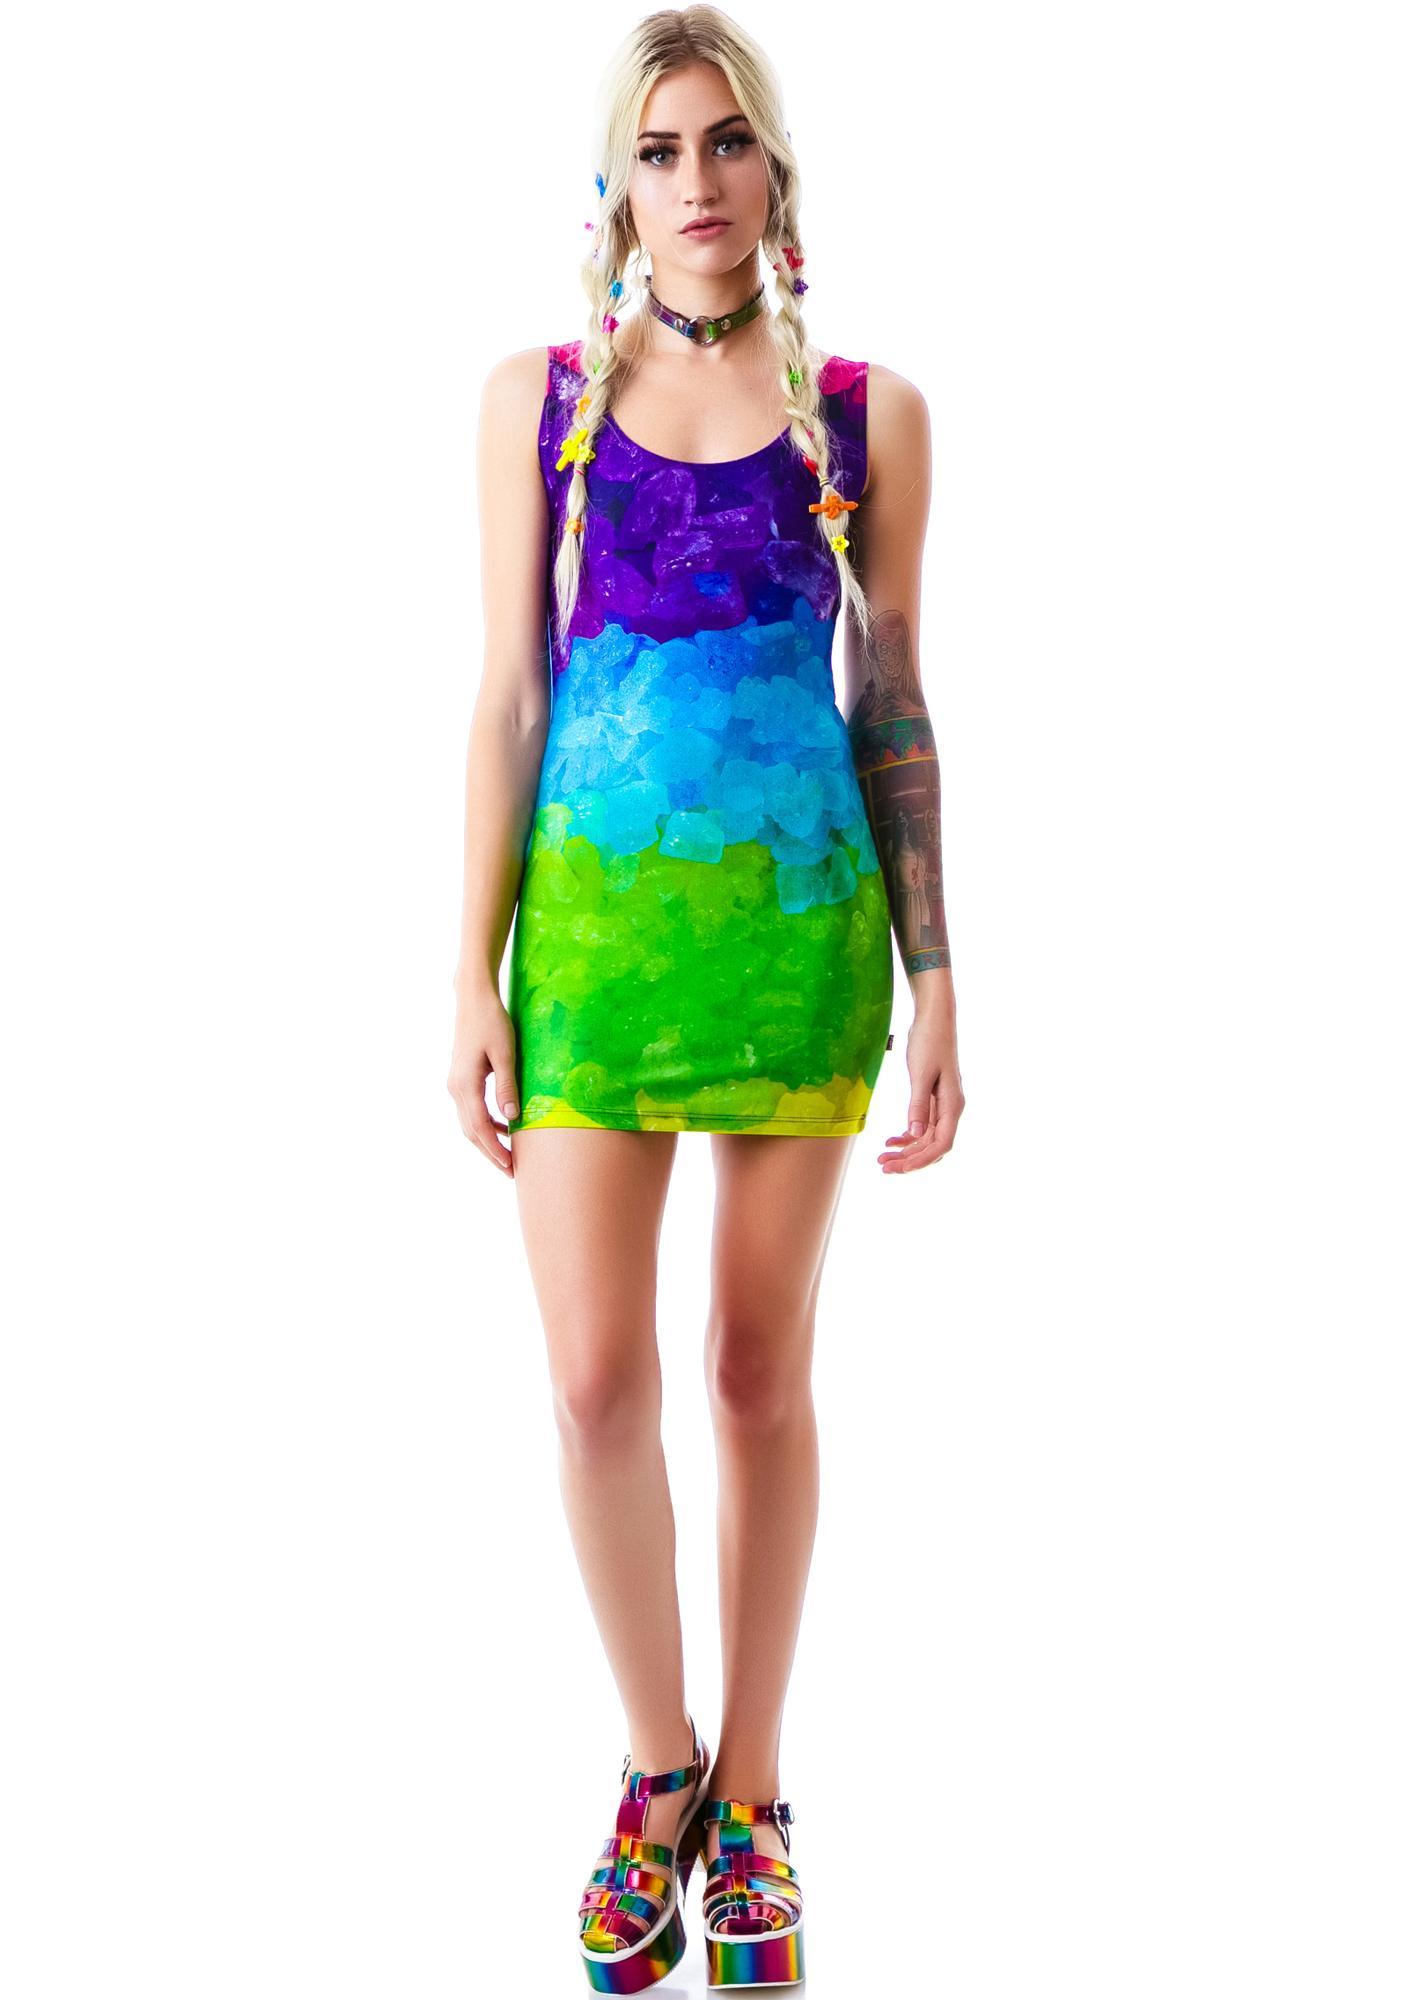 Zara Terez Rock Candy Dress